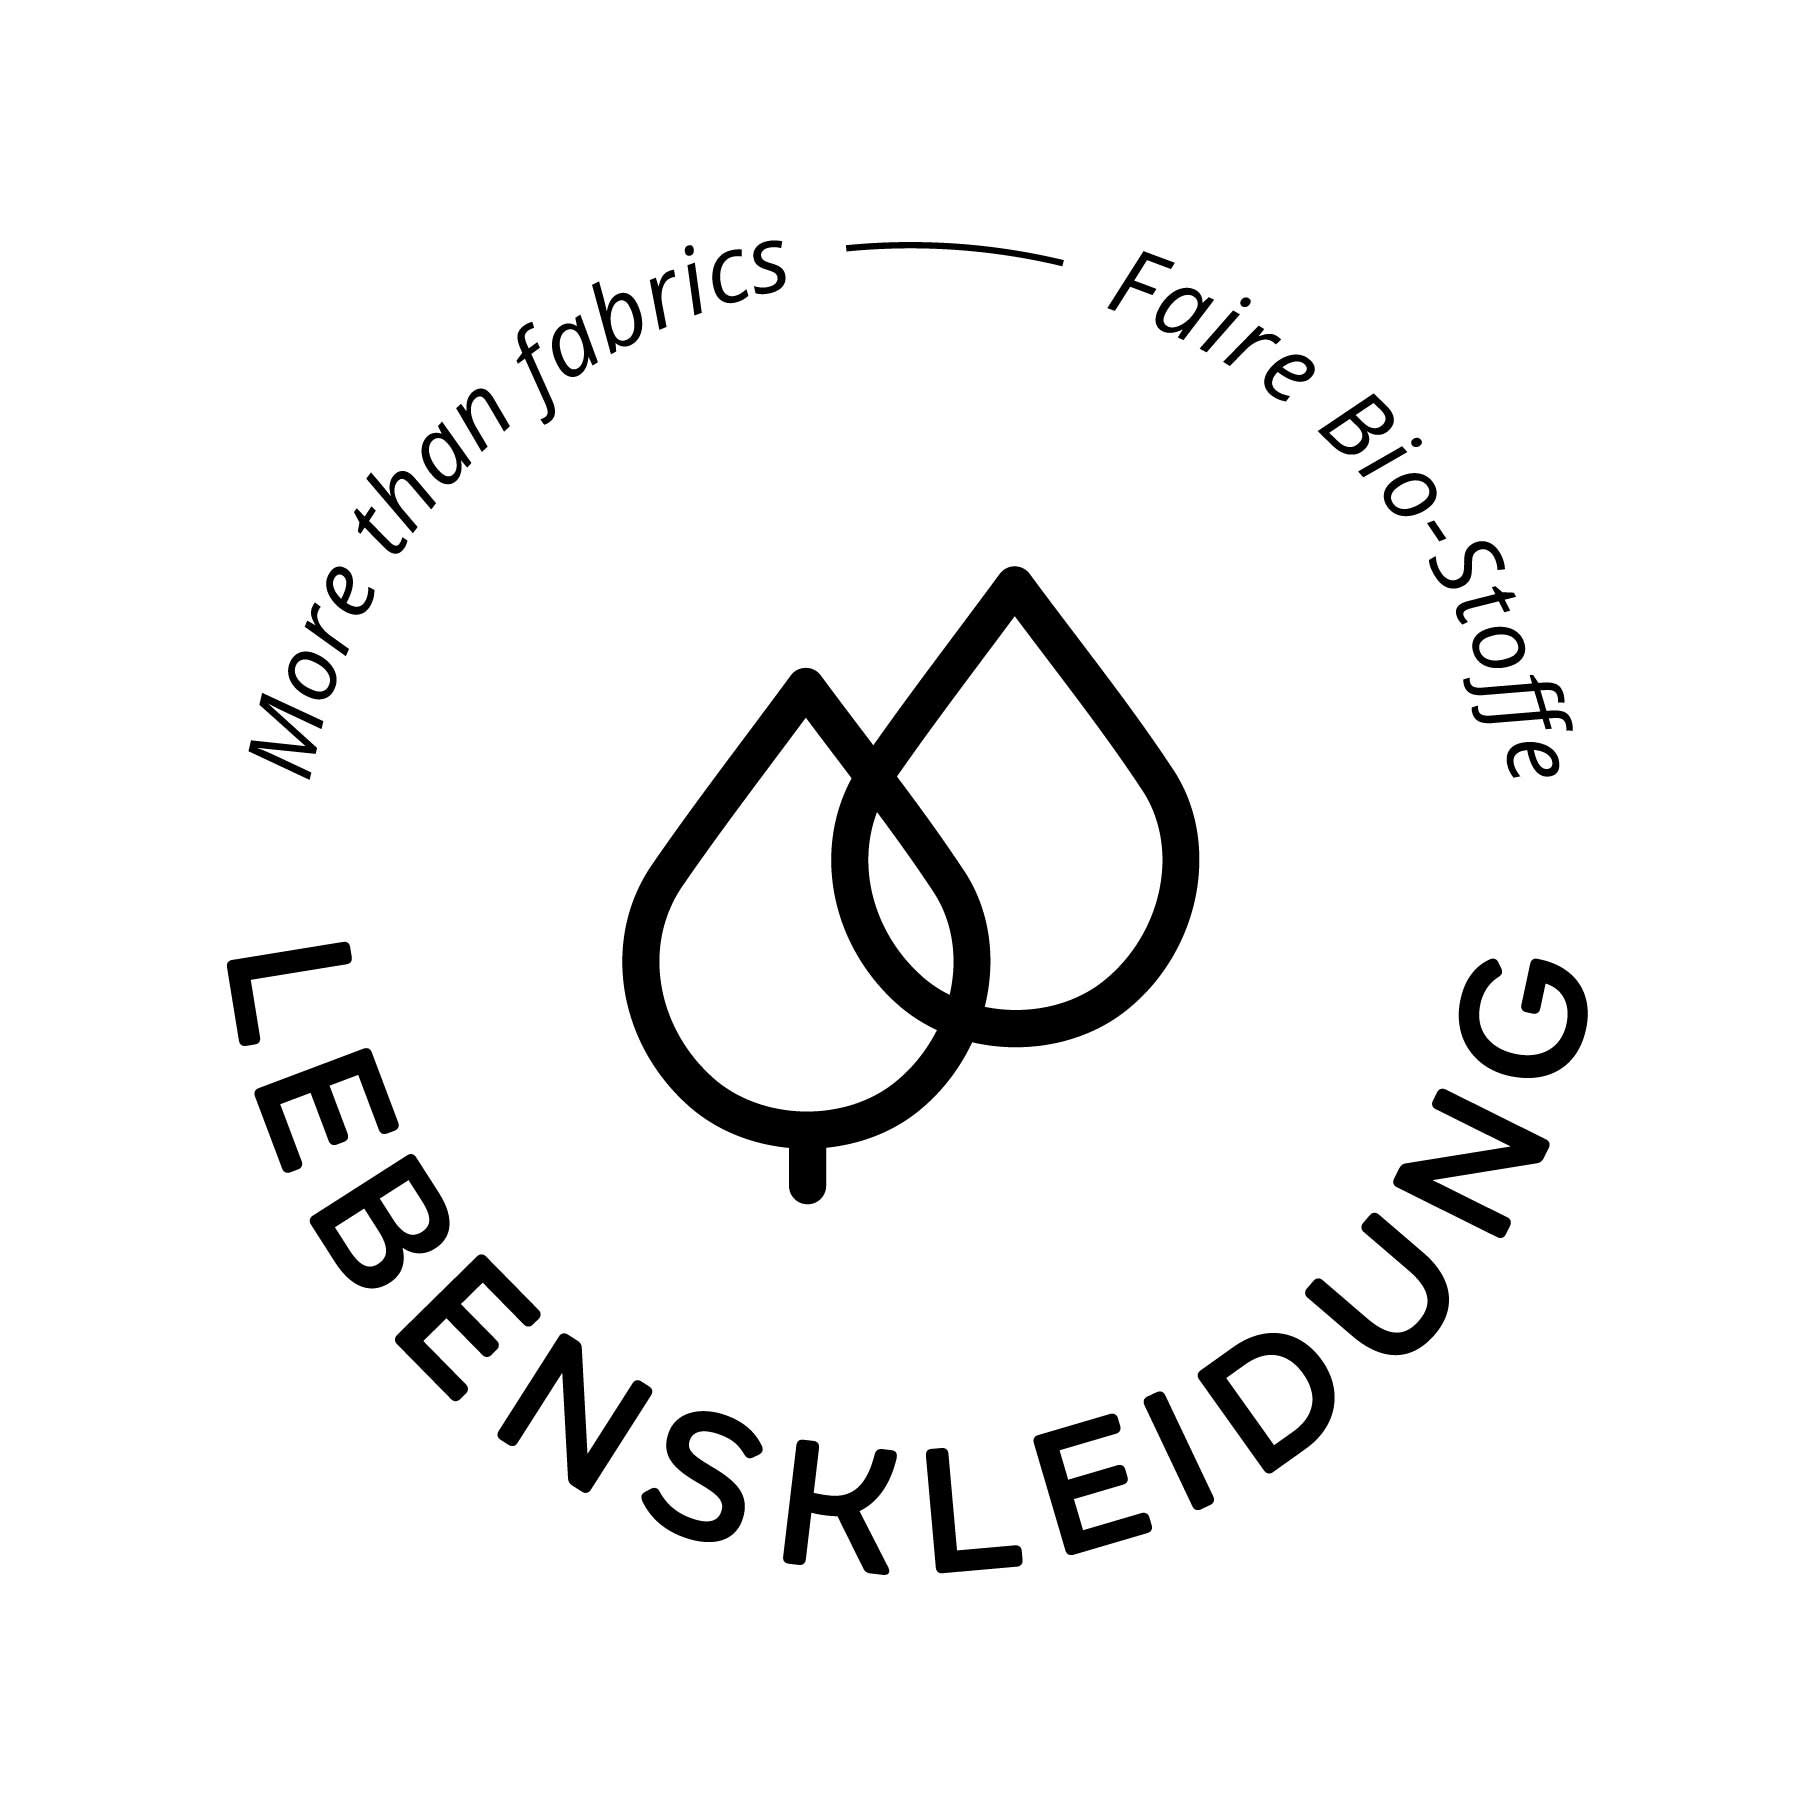 Bio Tessuto di RIB 2x1 (Polsino) - Chilli